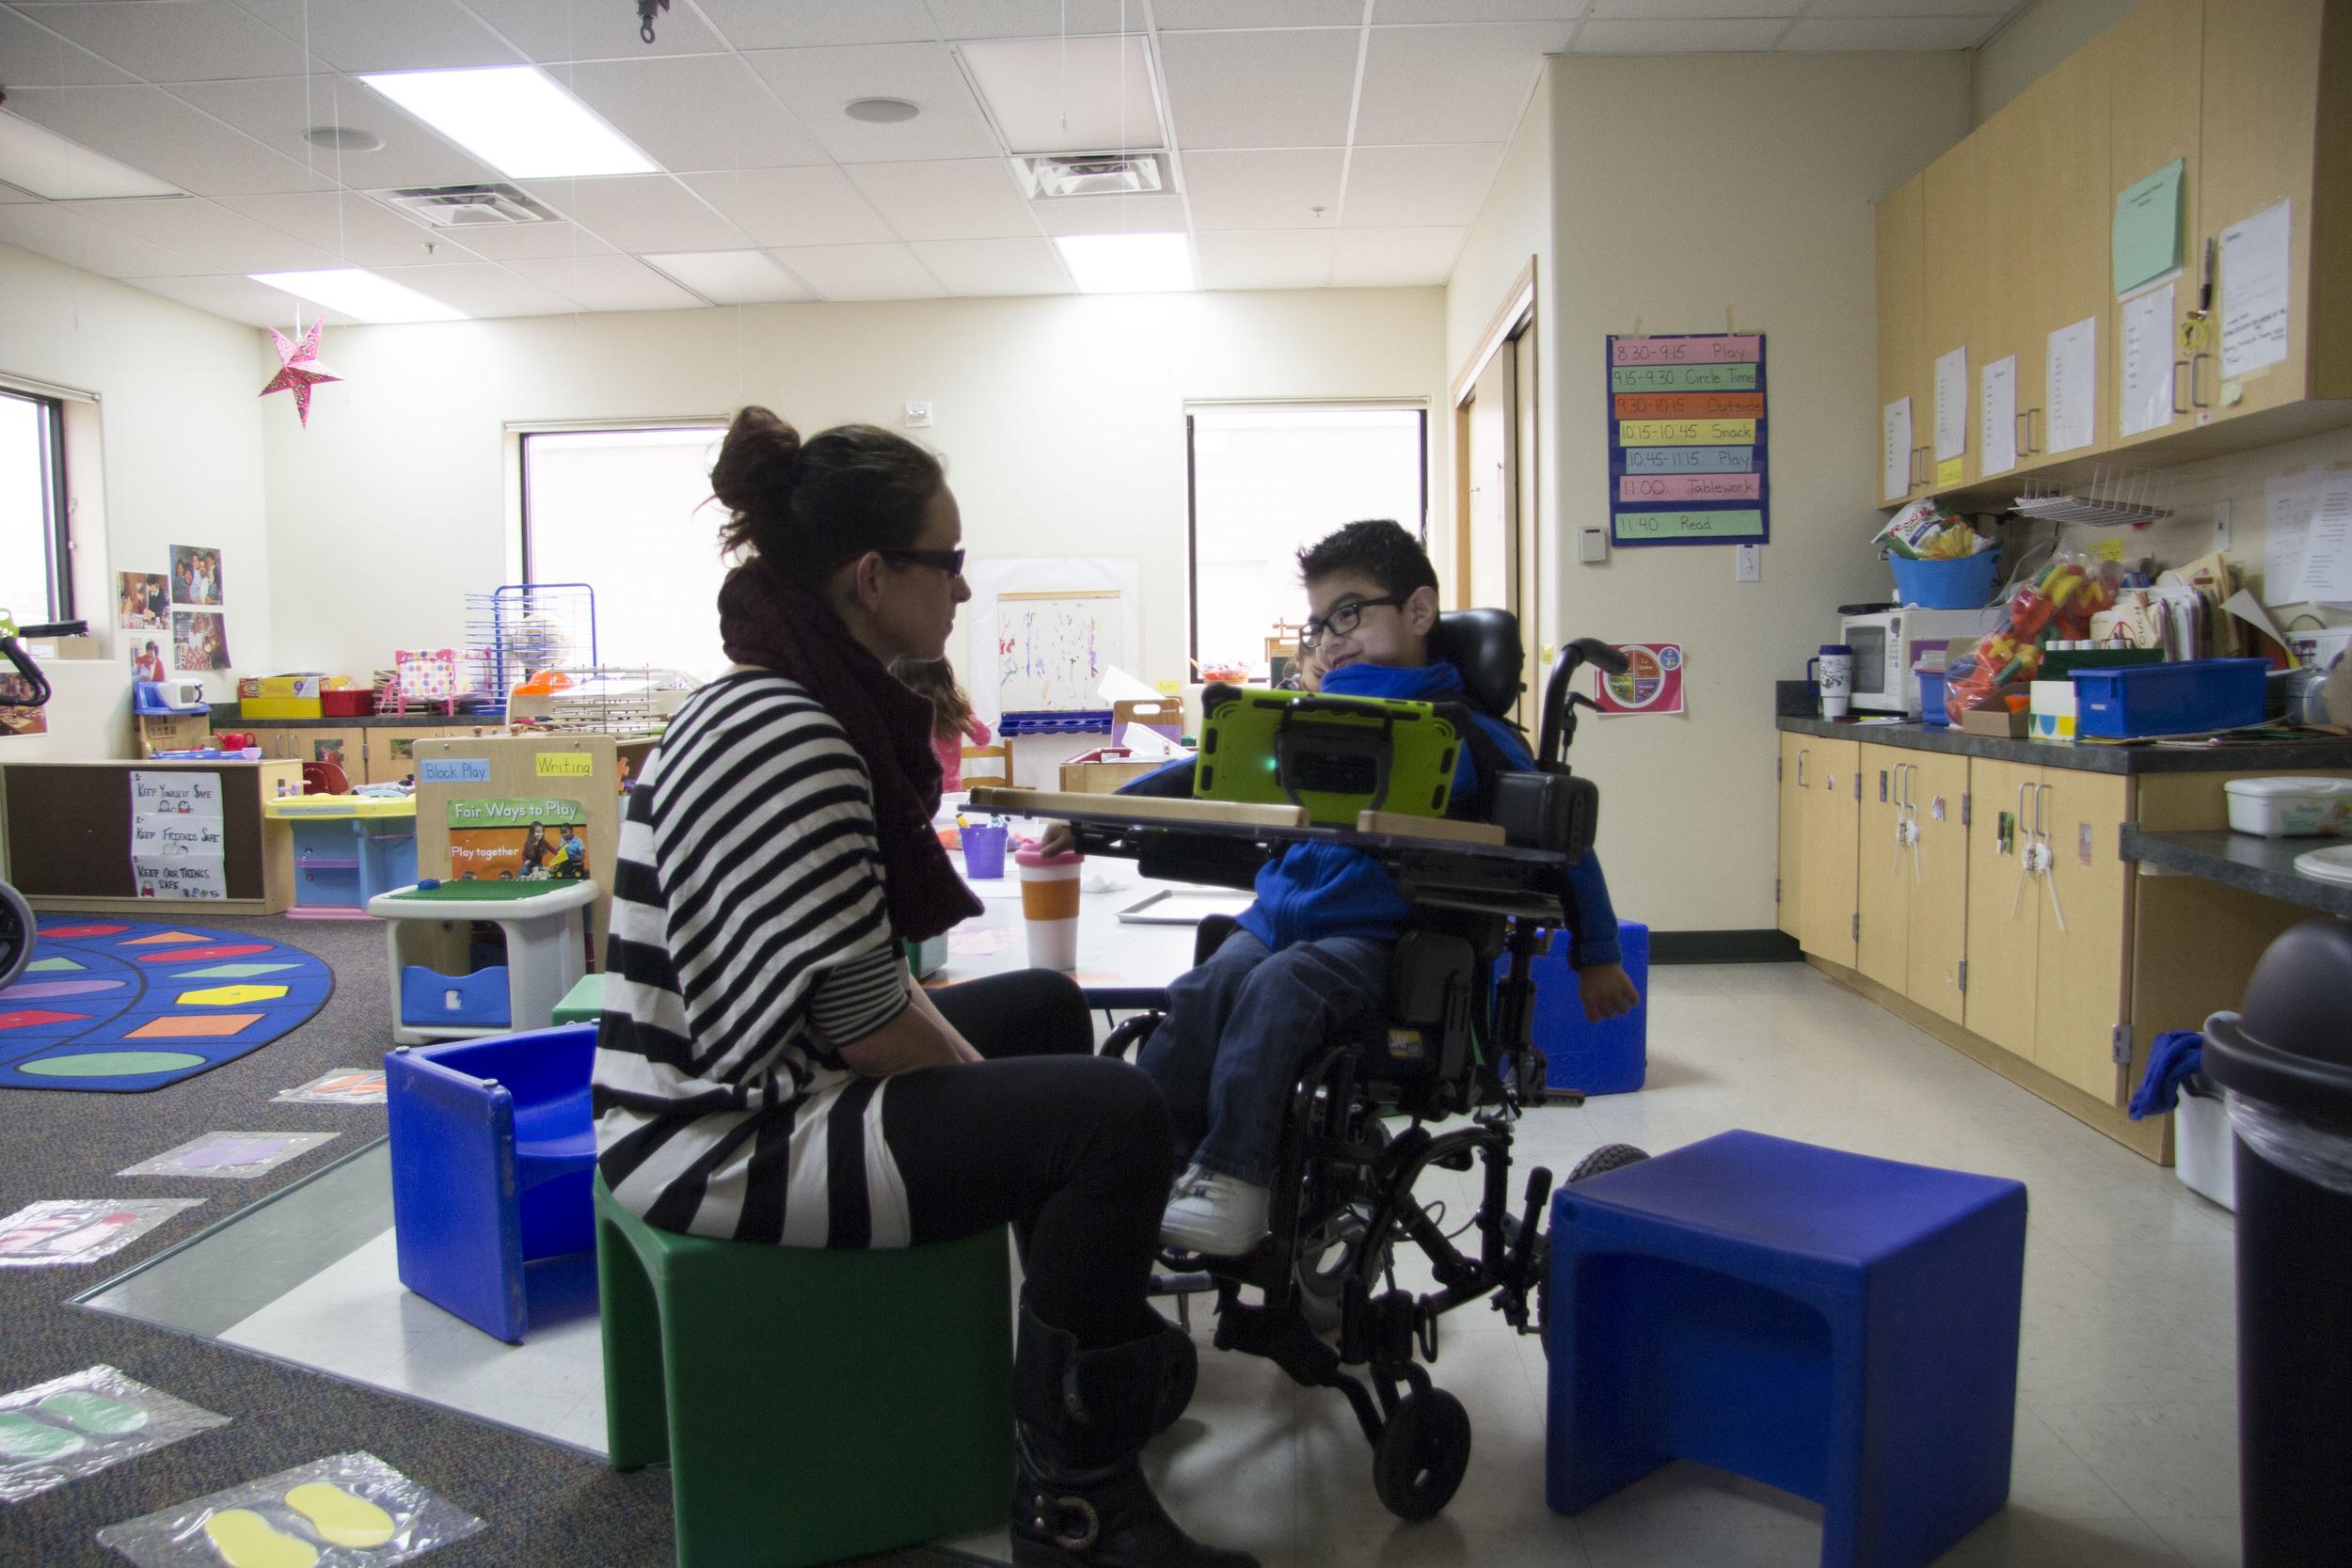 a tlc teacher works with a tlc preschool student using a communication device